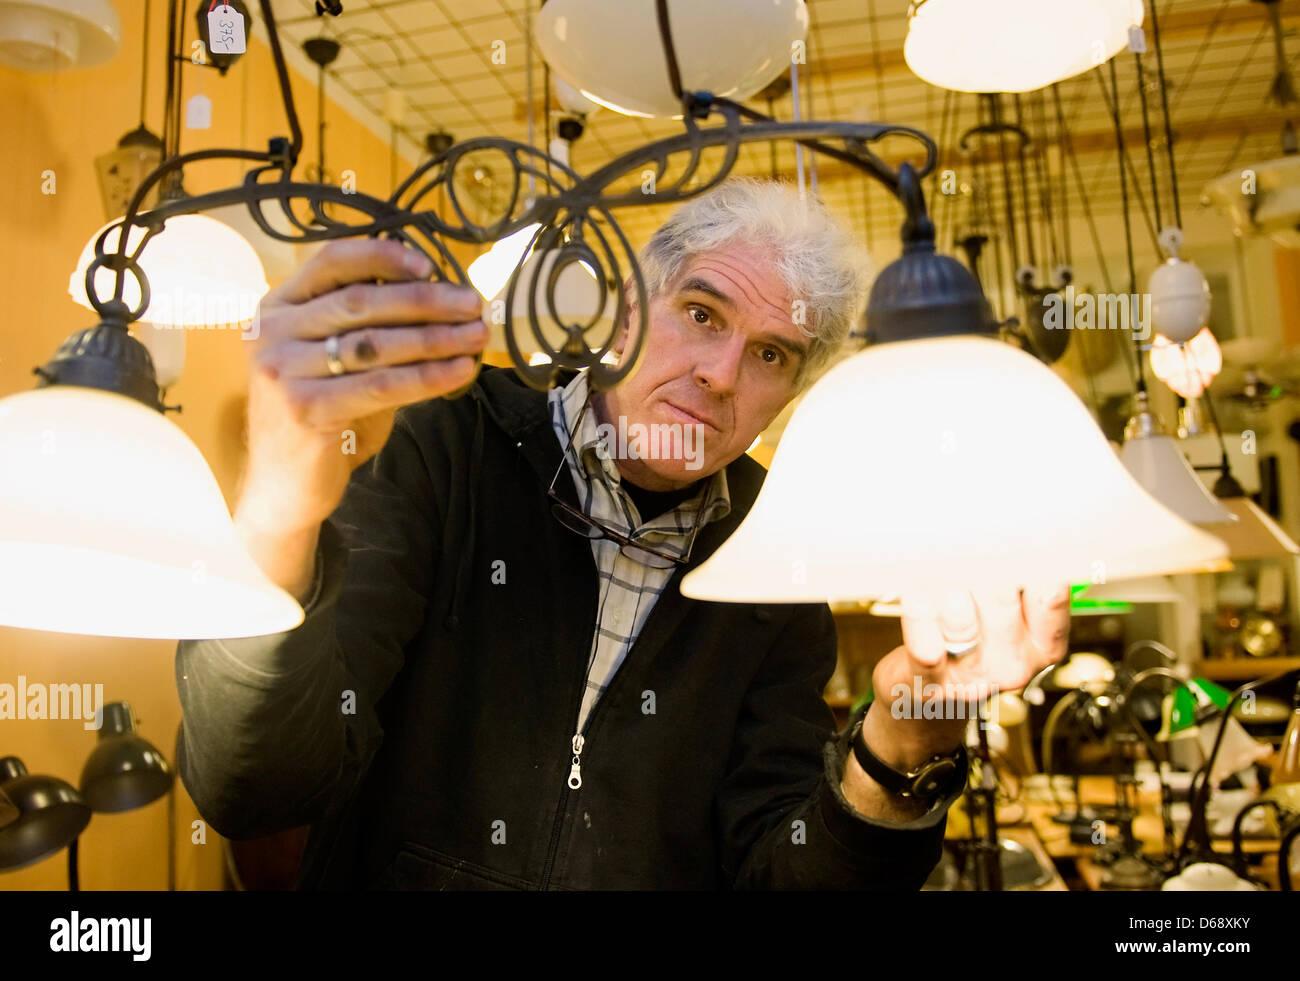 olaf bornemann presents old berlin brass lamps at. Black Bedroom Furniture Sets. Home Design Ideas